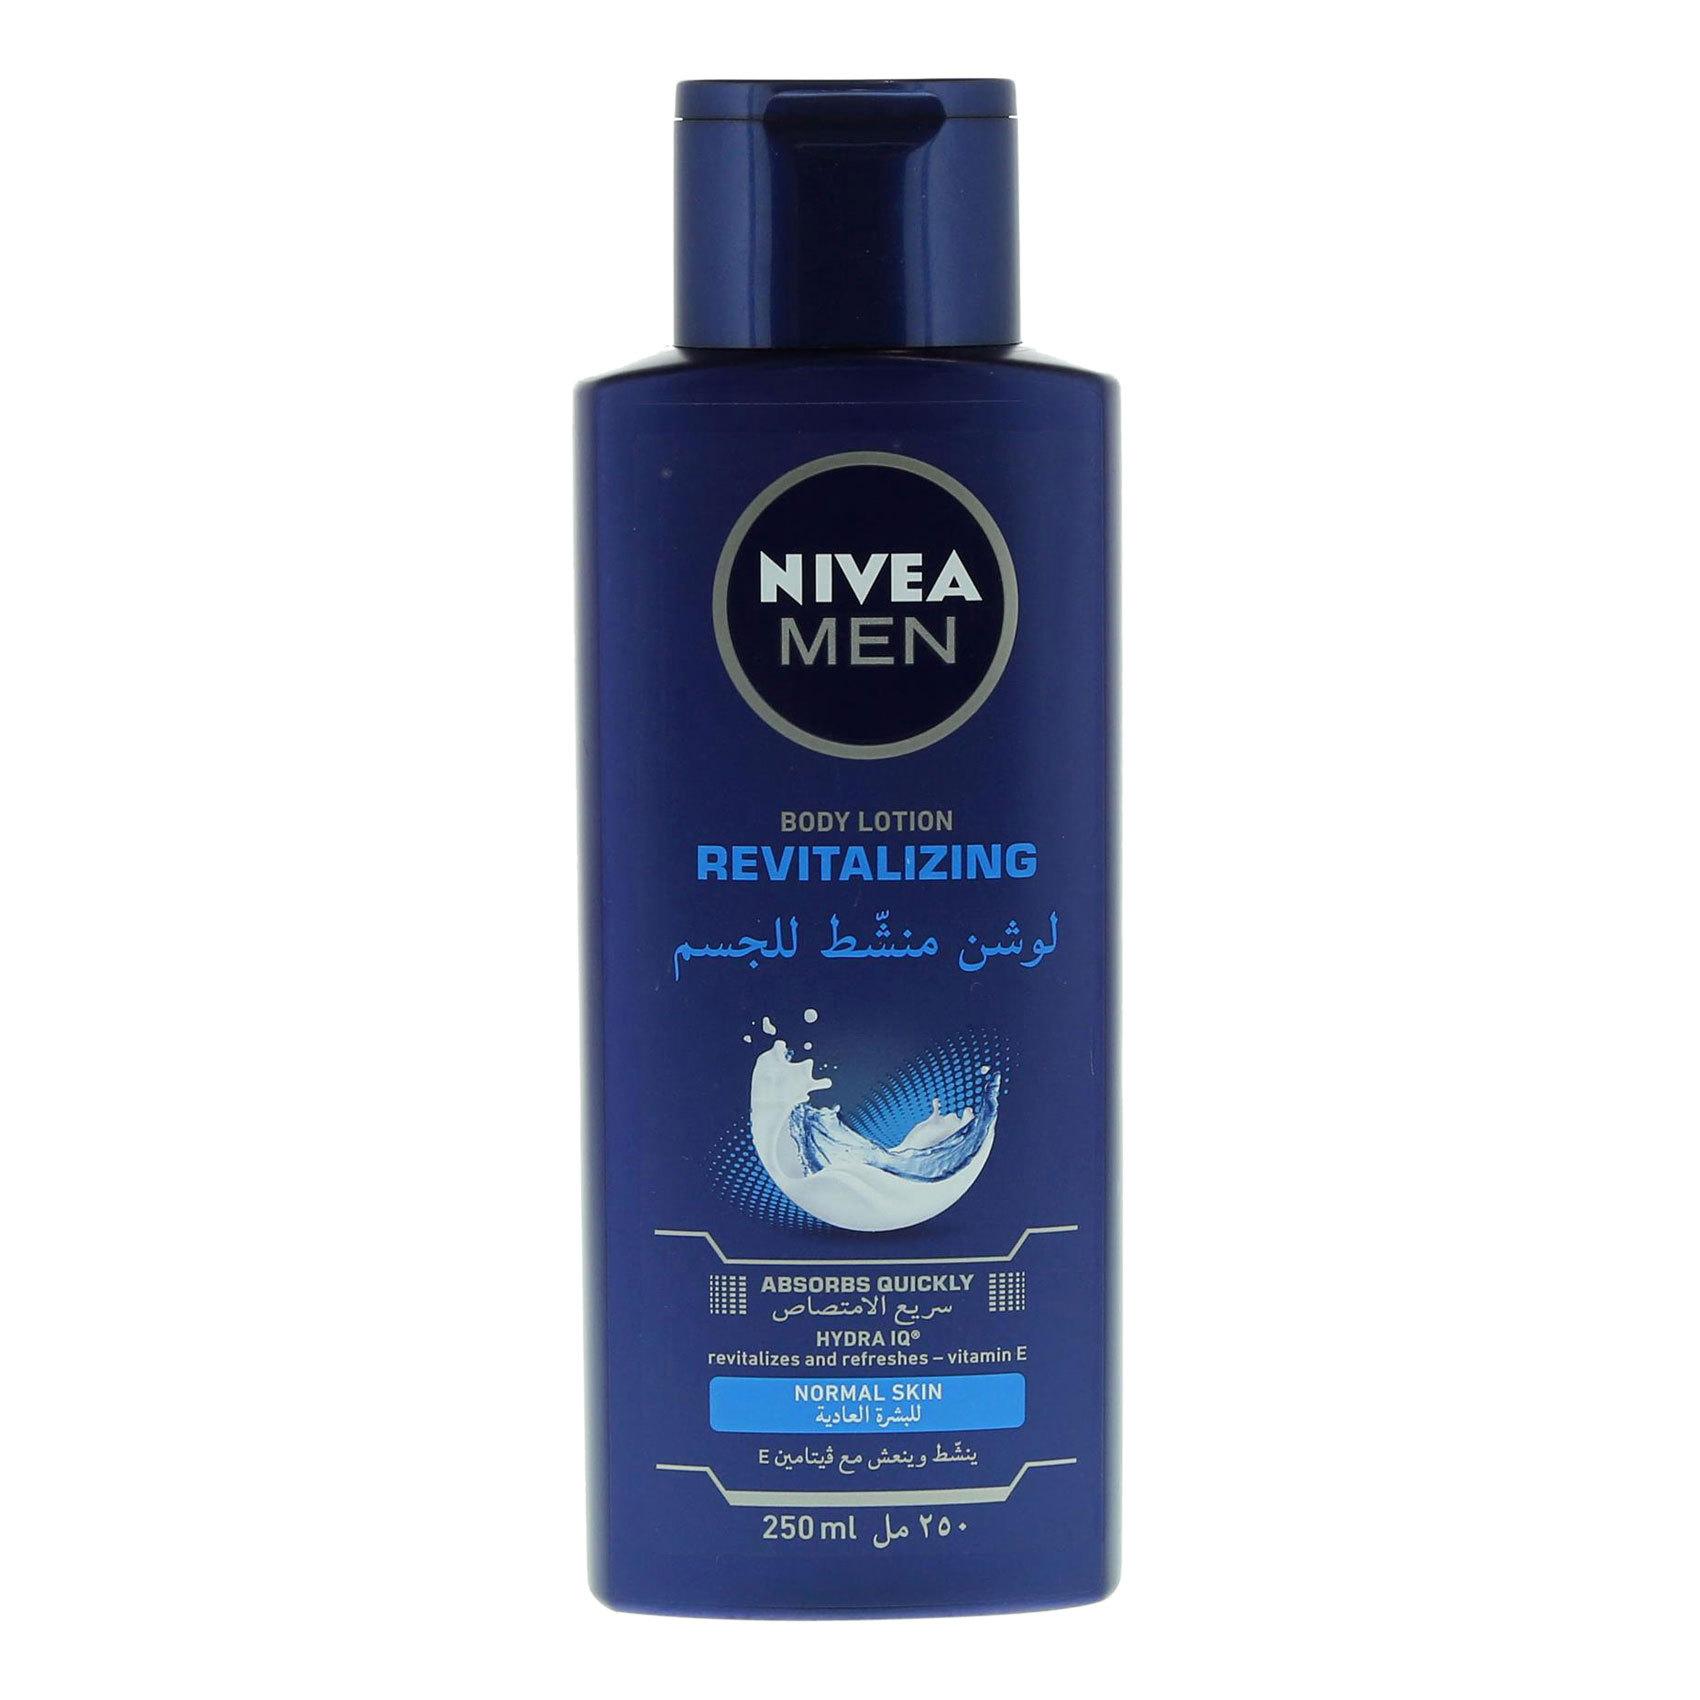 NIVEA FOR MEN BODY LOTION 250ML